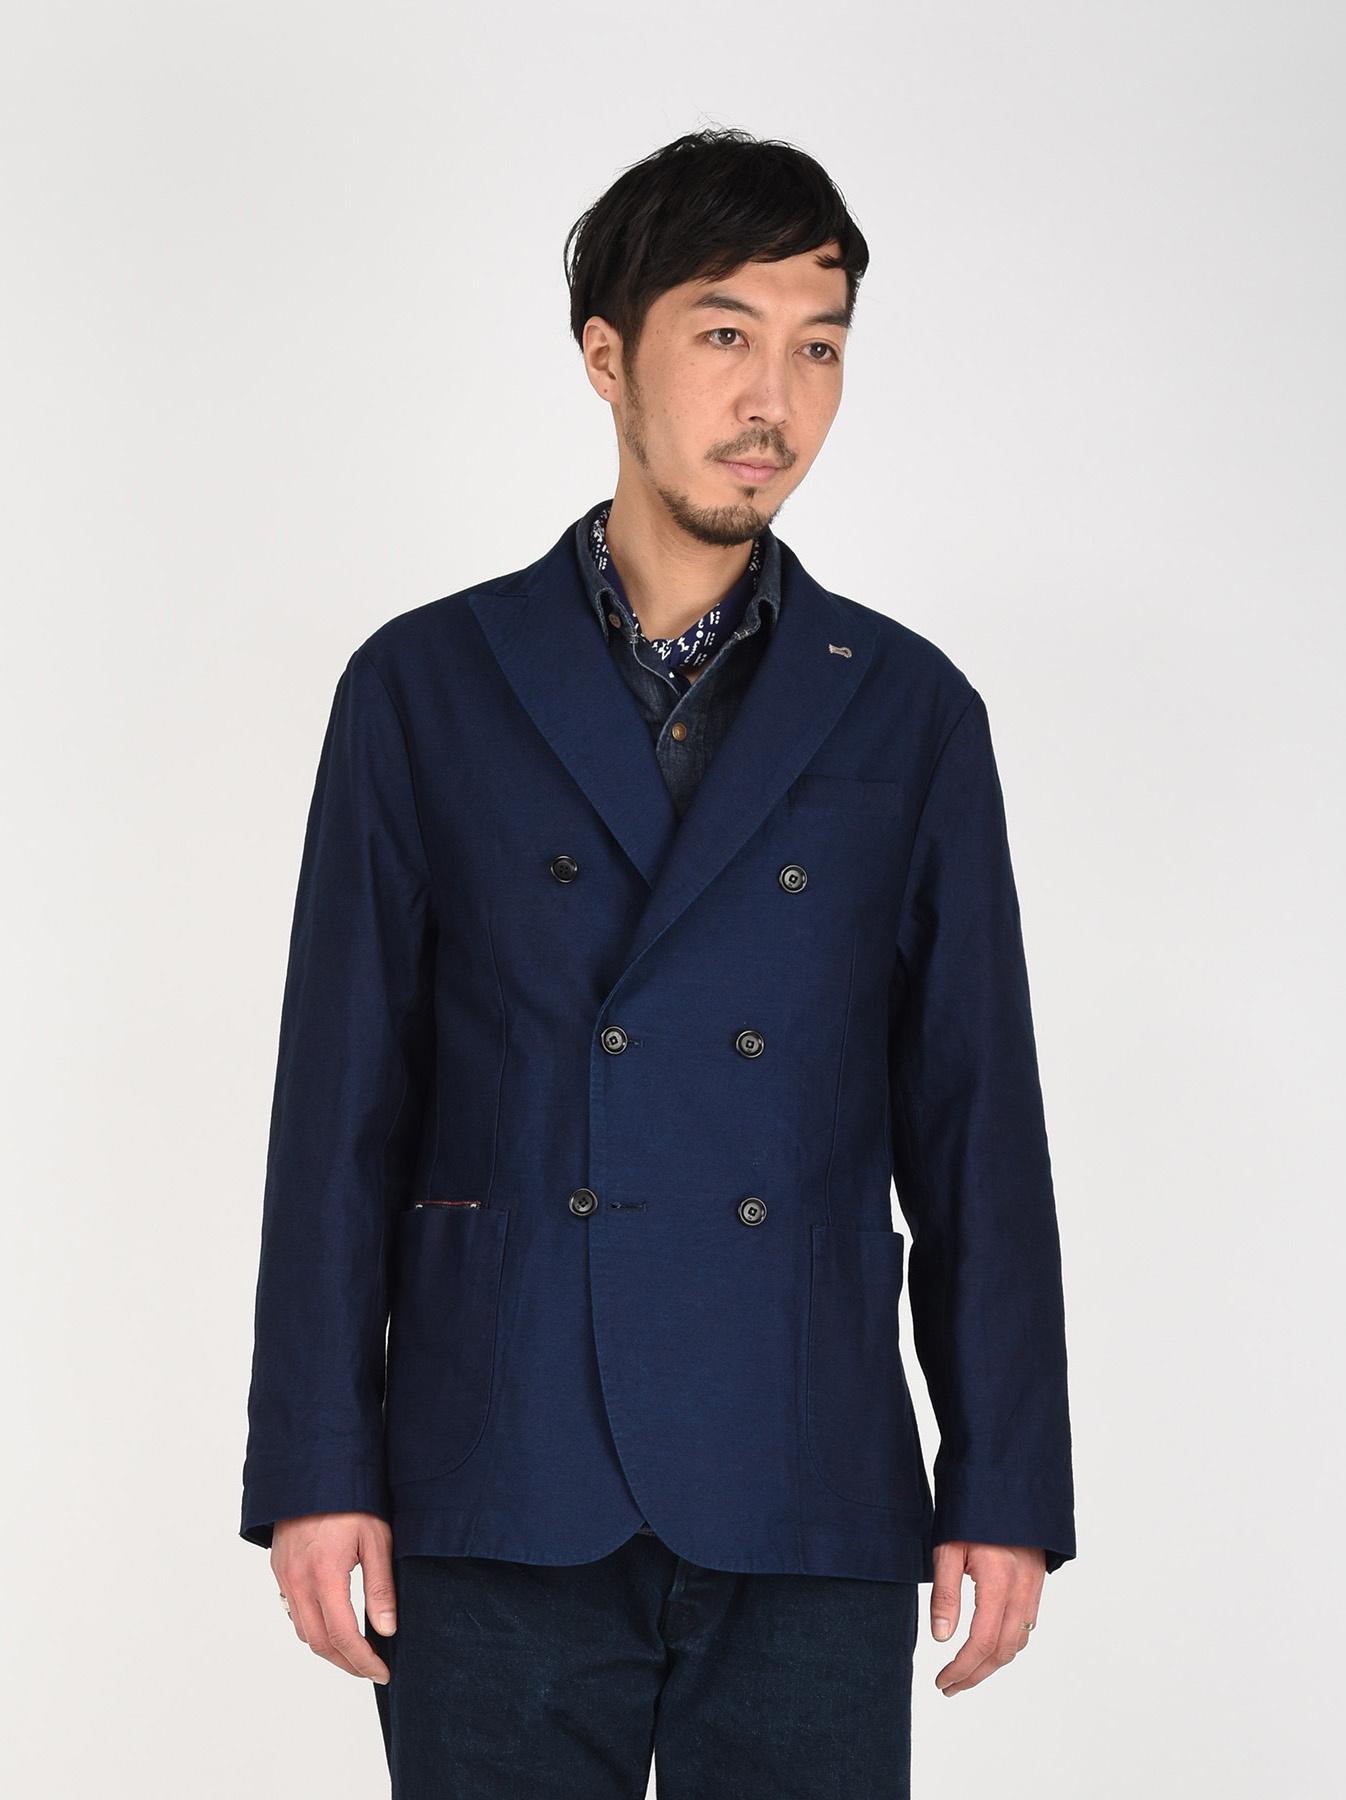 Indigo Mugi Yoko-shusi Soroe Double Breasted Jacket-3